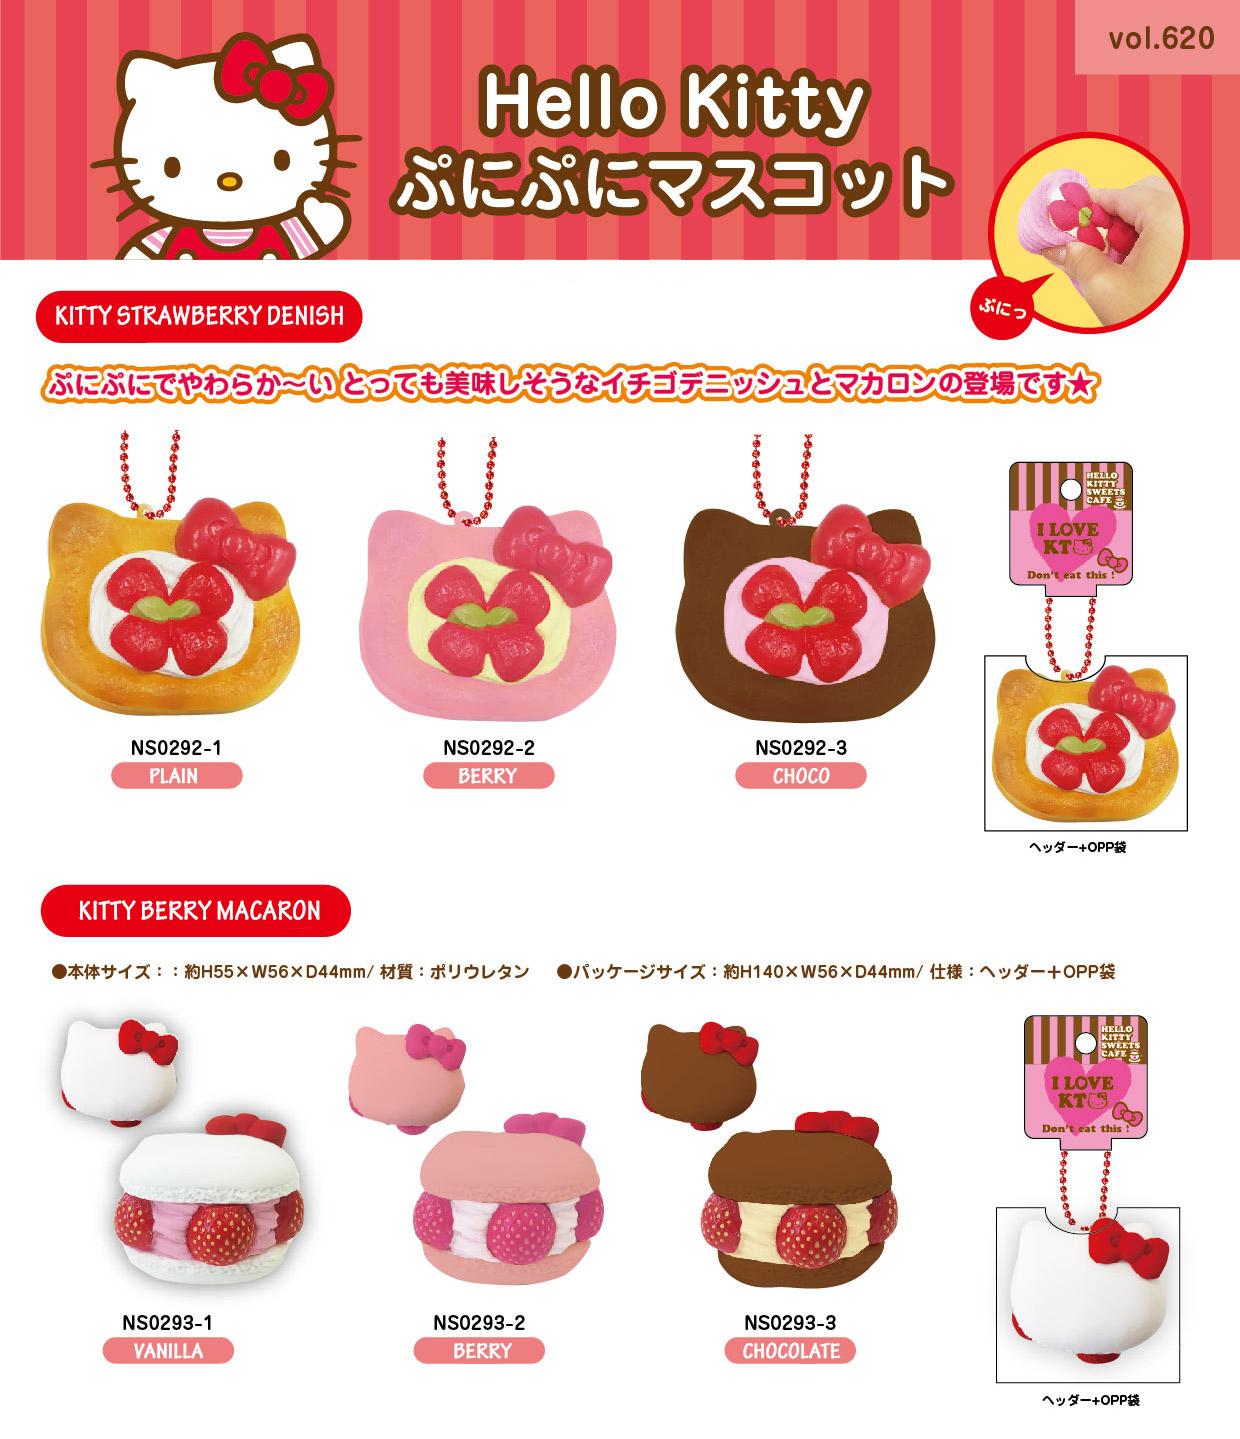 New Item Creative – Hello Kitty Strawberry Denish And Berry Macaron